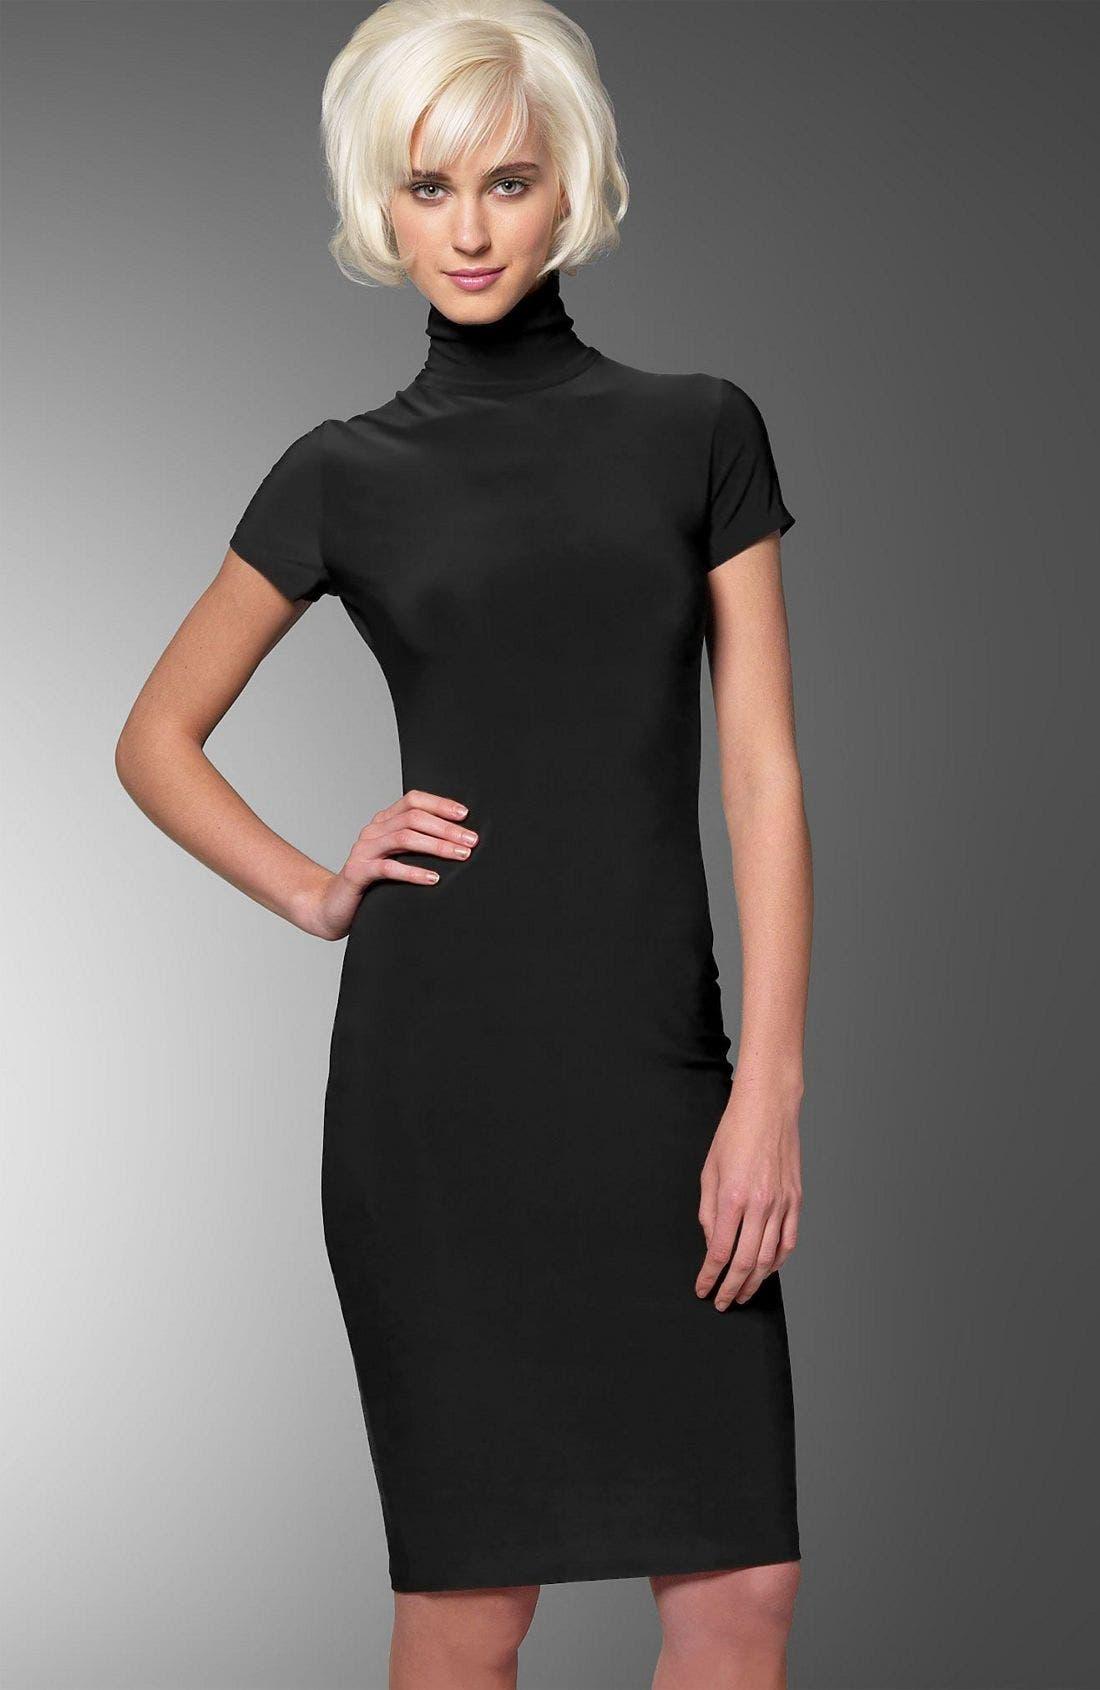 Short Sleeve Turtleneck Dress,                             Main thumbnail 1, color,                             BLK